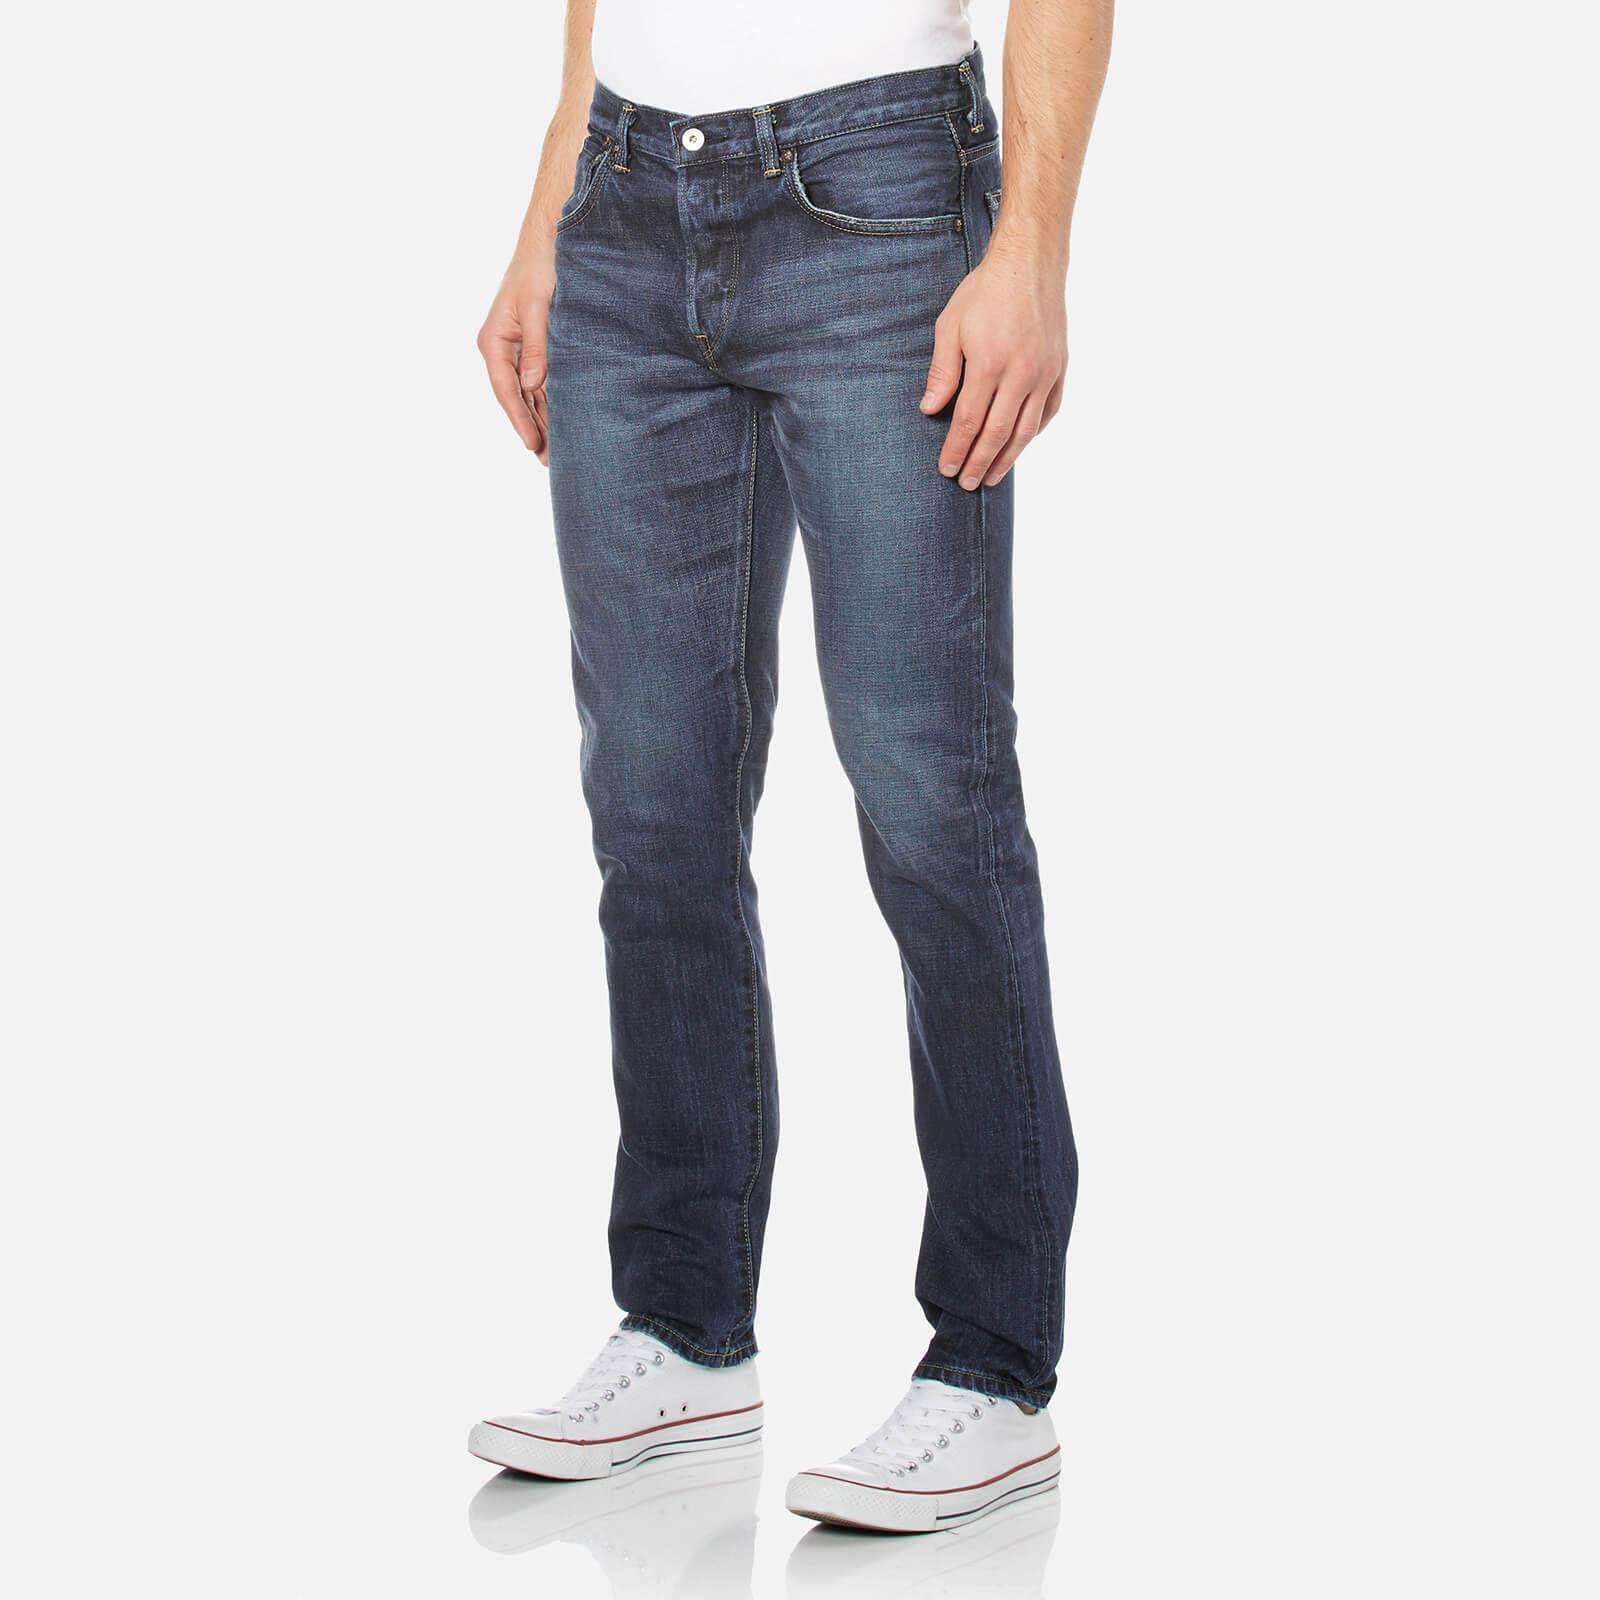 Edwin Denim Classic Regular Tapered Jeans in Blue for Men